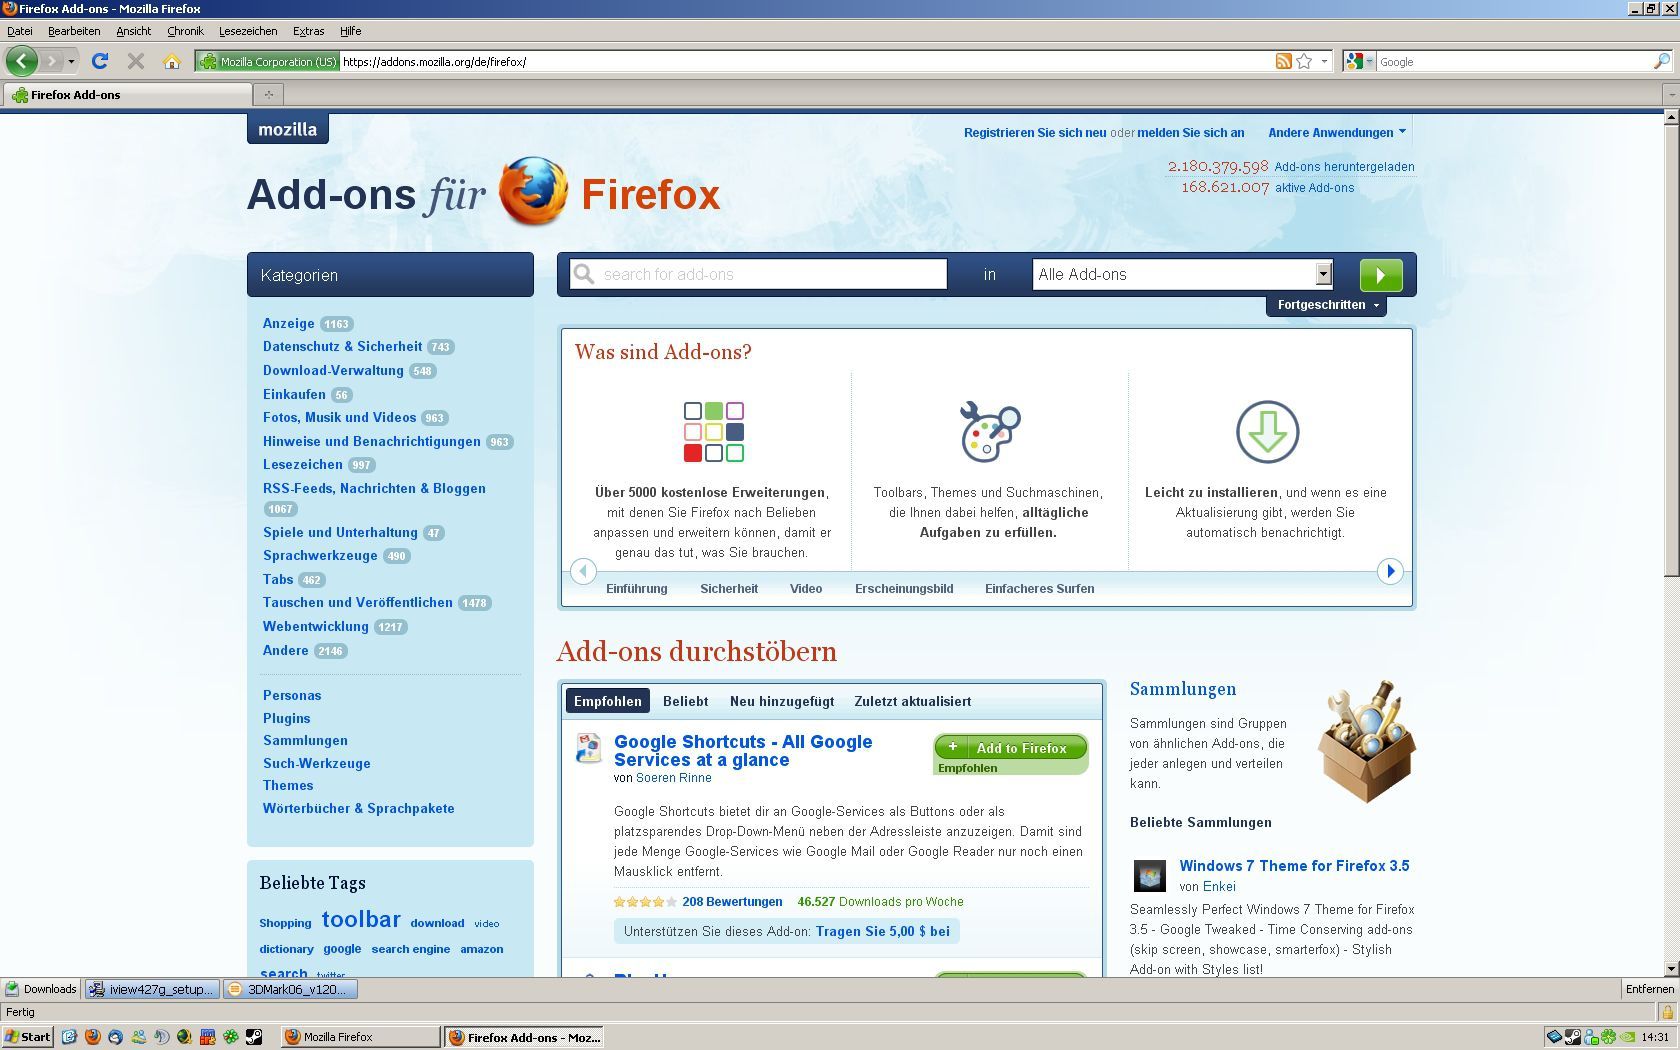 1-Firefox-Add-on-Download-Statusbar-Addon-Webseite-_Firefox-470.jpg